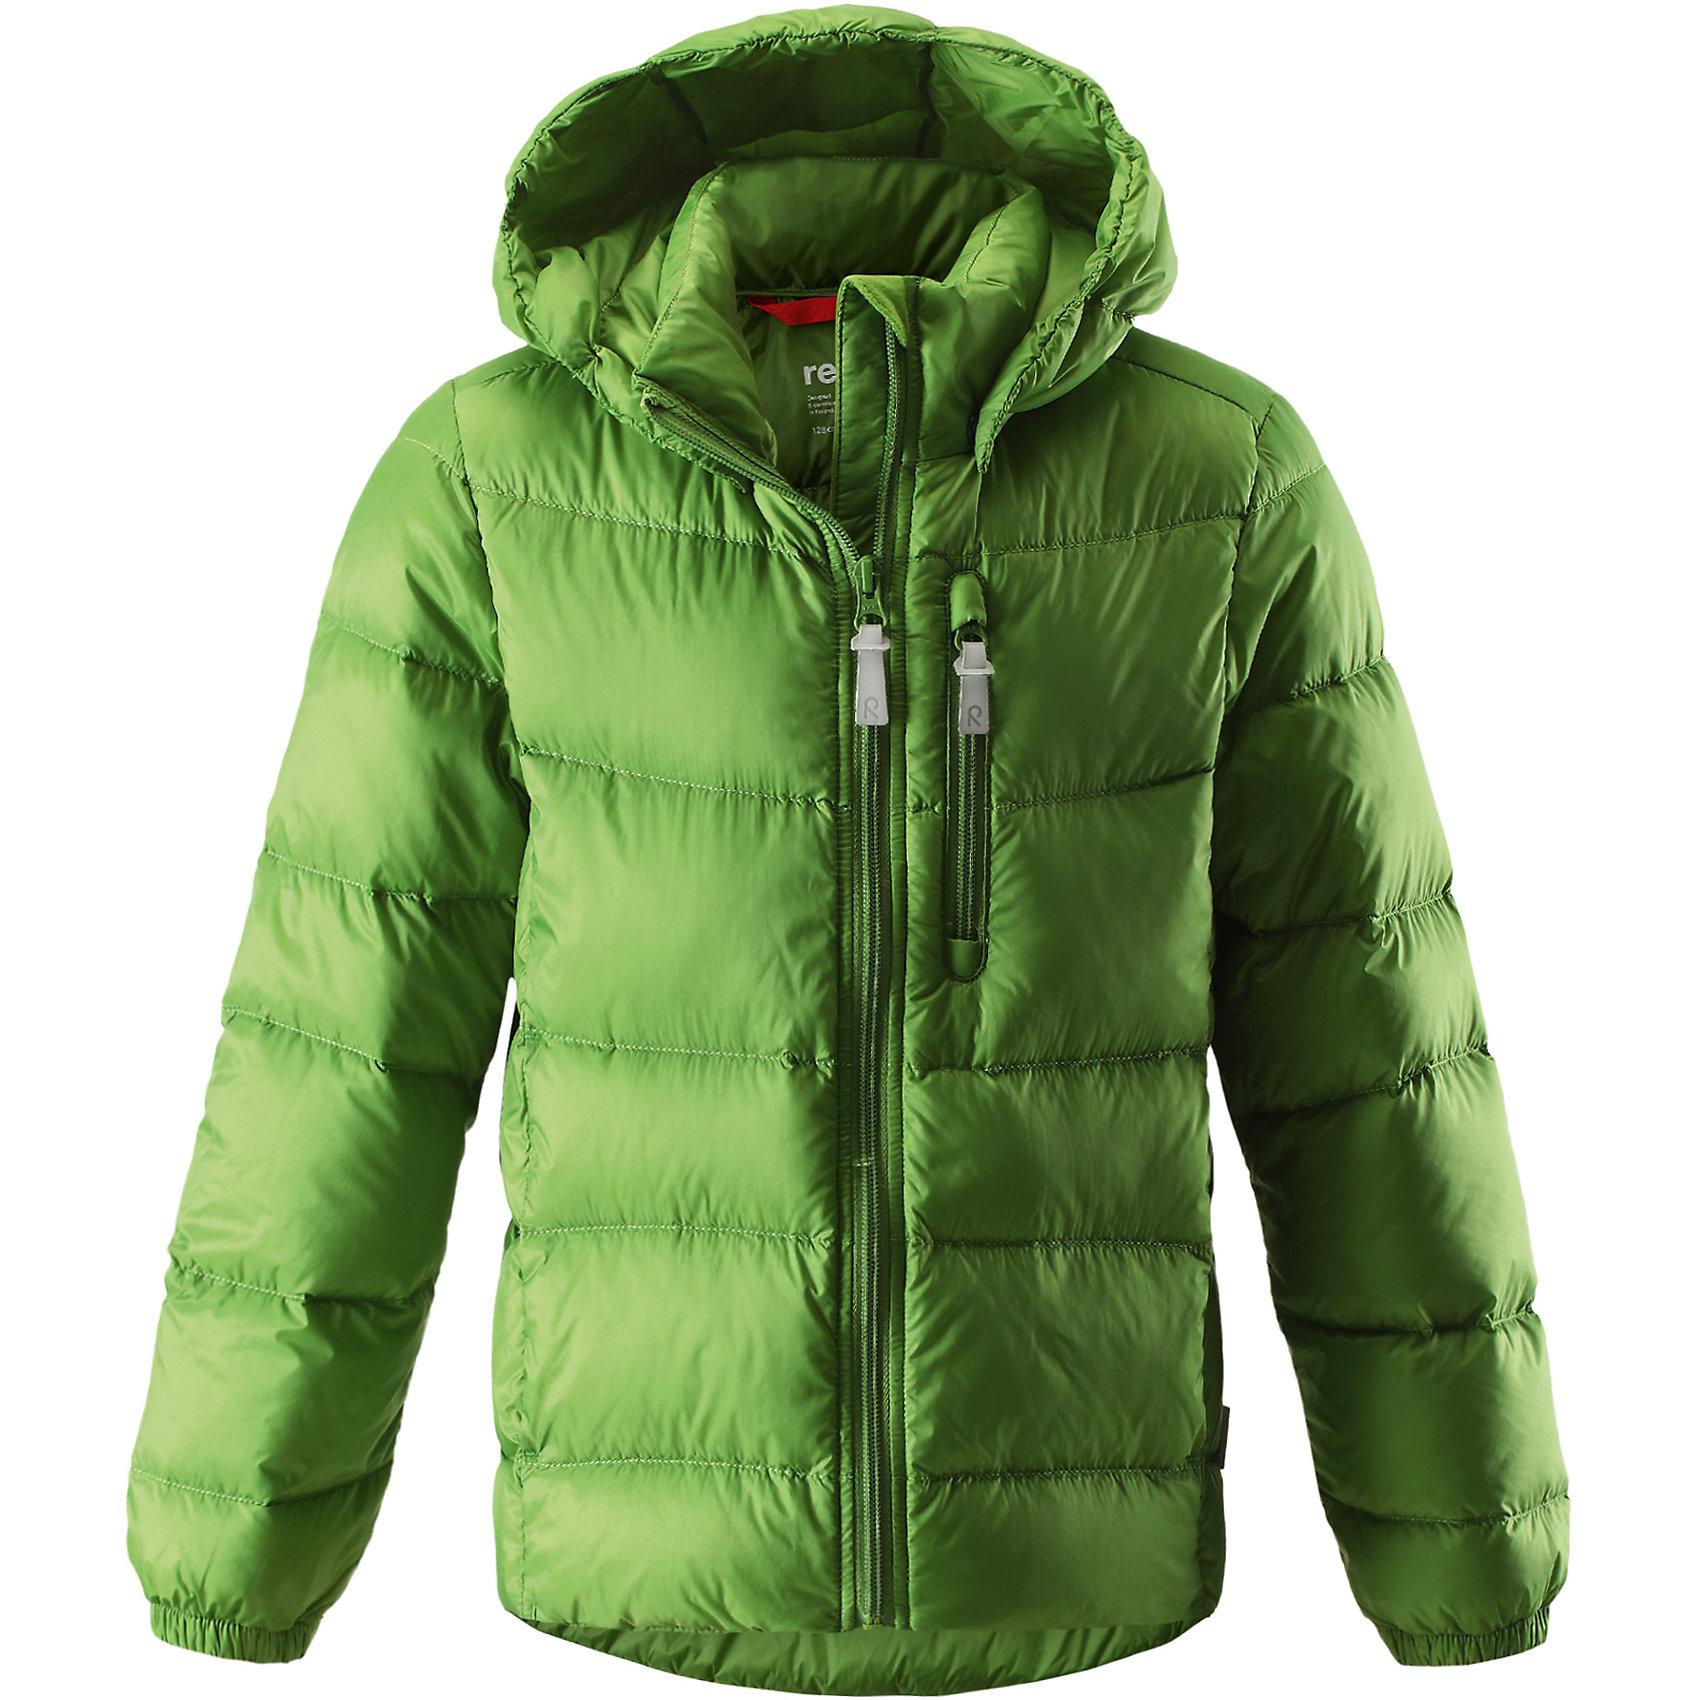 Куртка Midnight ReimaОдежда<br>Куртка<br>Состав:<br>100% ПЭ, ПУ-покрытие<br><br>Ширина мм: 356<br>Глубина мм: 10<br>Высота мм: 245<br>Вес г: 519<br>Цвет: зеленый<br>Возраст от месяцев: 72<br>Возраст до месяцев: 84<br>Пол: Унисекс<br>Возраст: Детский<br>Размер: 122,164,98,110,128,140,152<br>SKU: 5309310